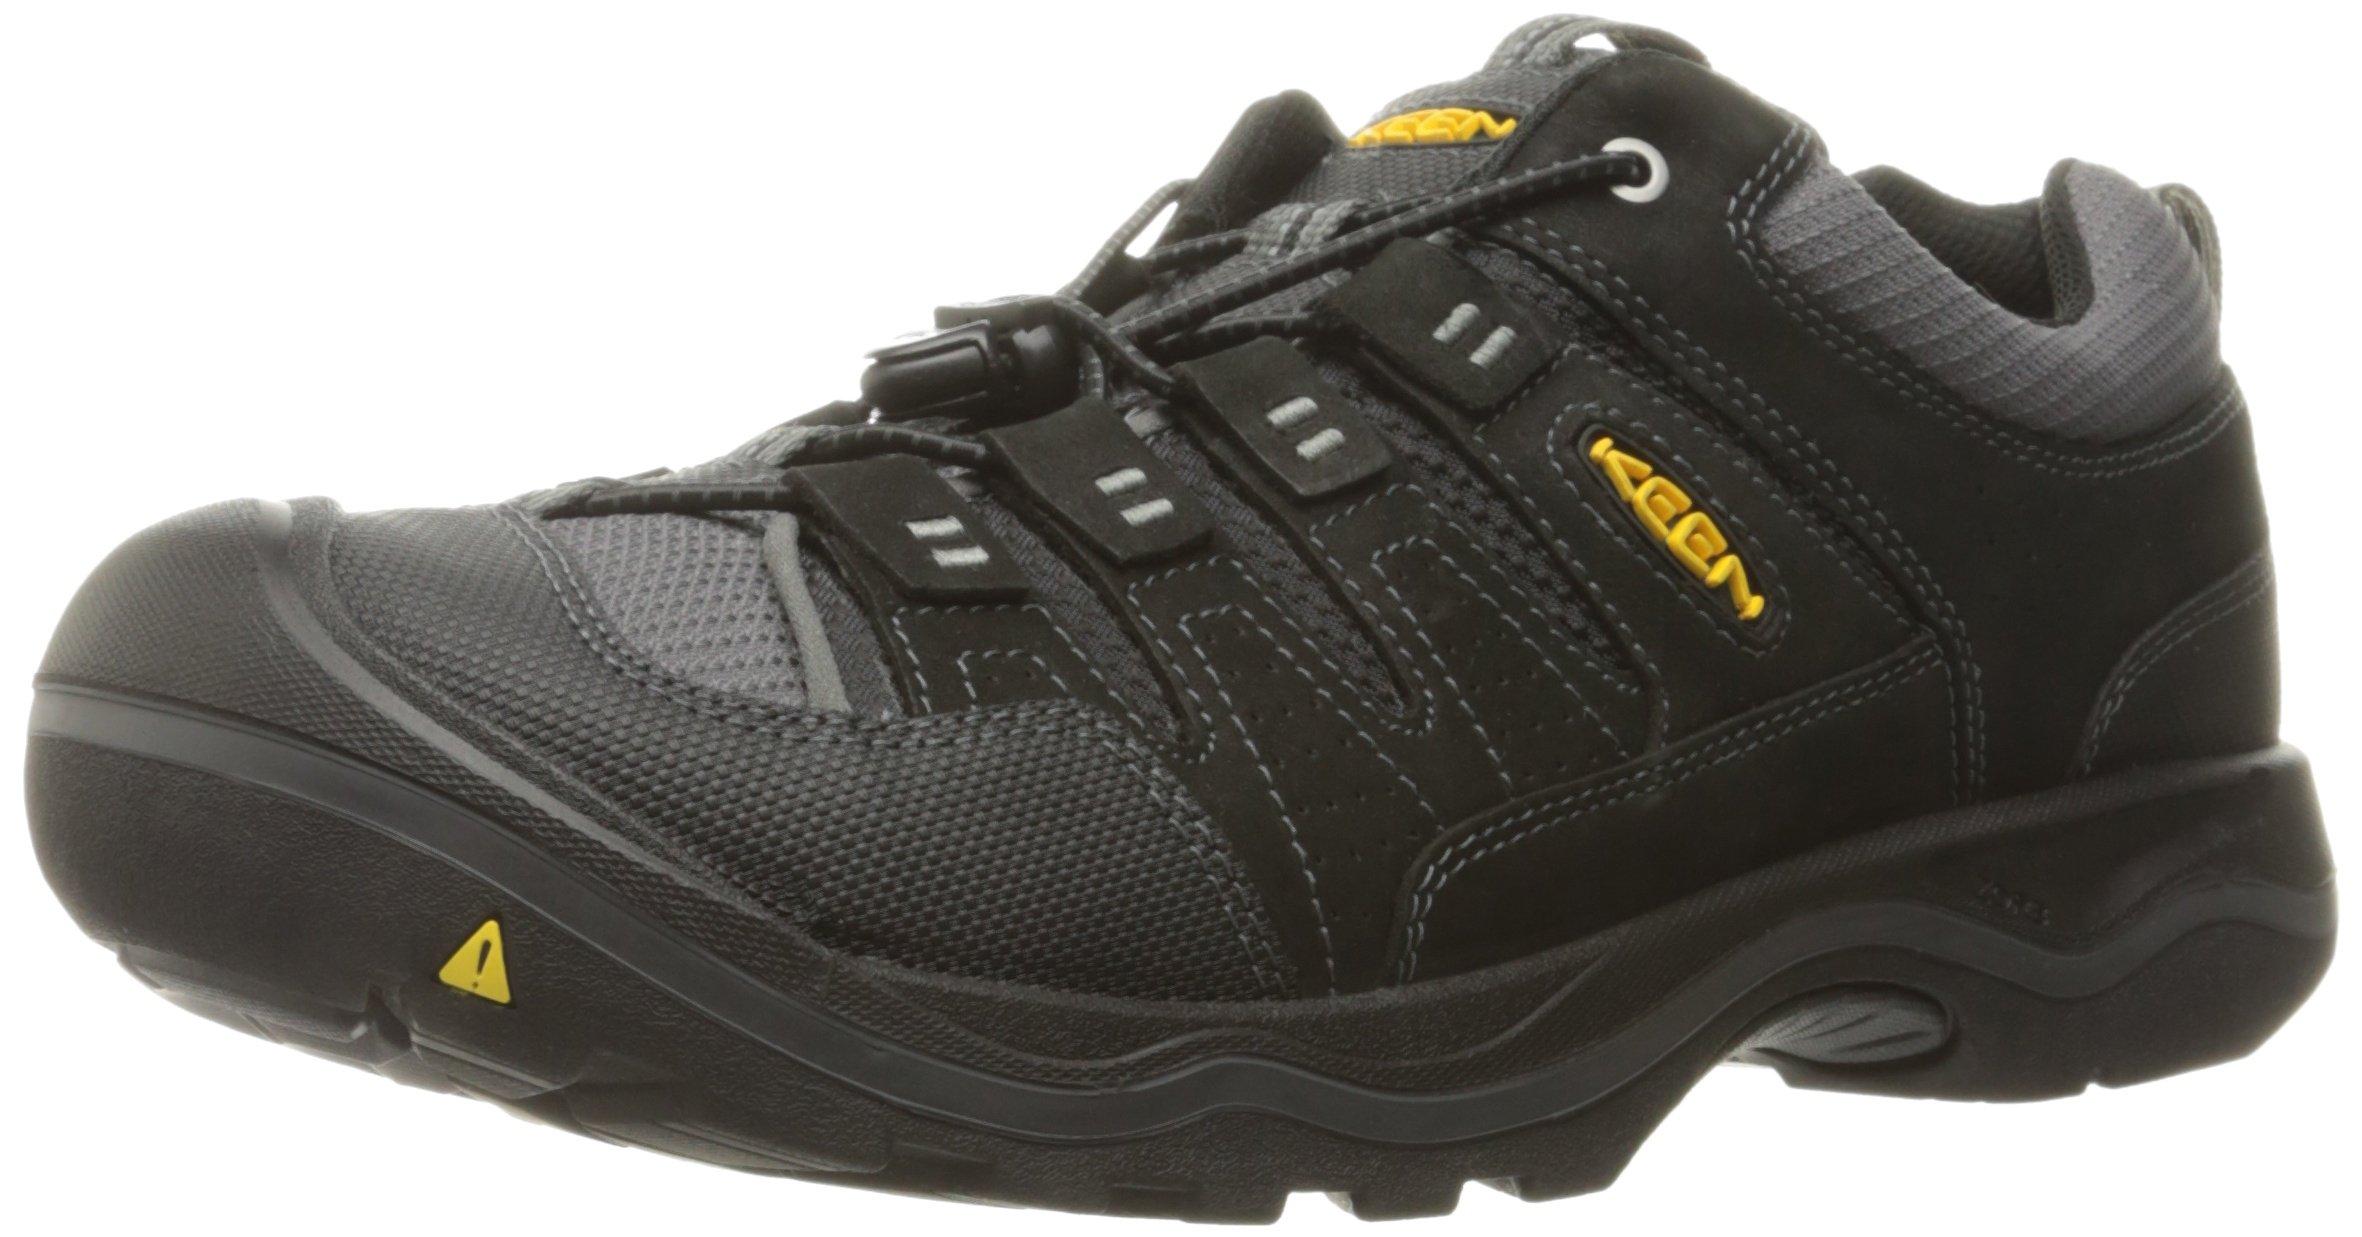 KEEN Men's Rialto Traveler Shoe, Black, 7.5 M US